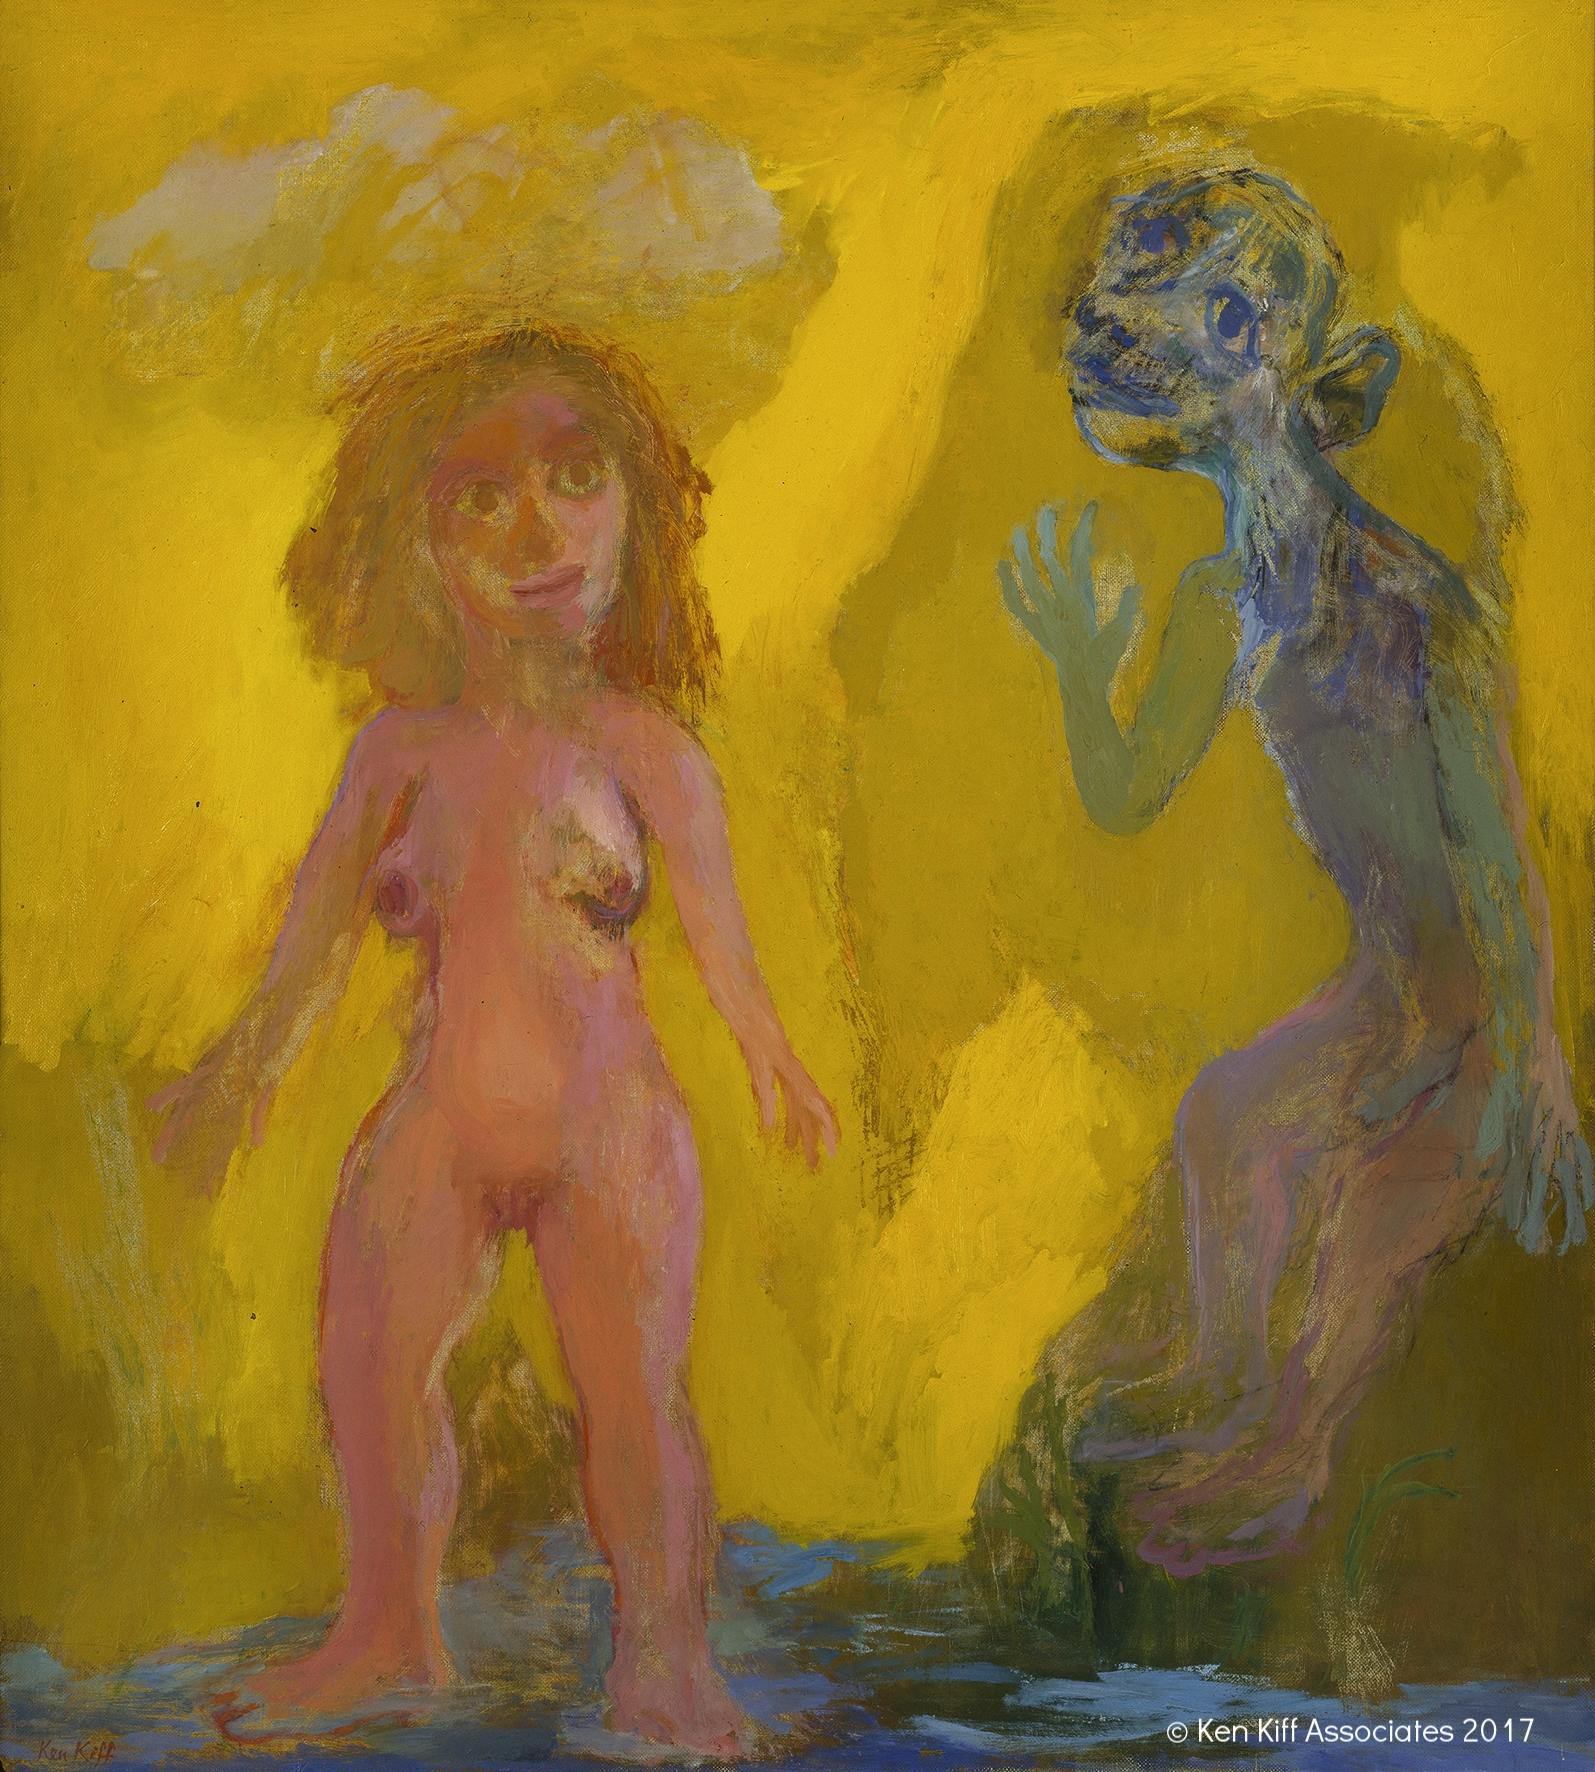 Ken Kiff - Man and Woman